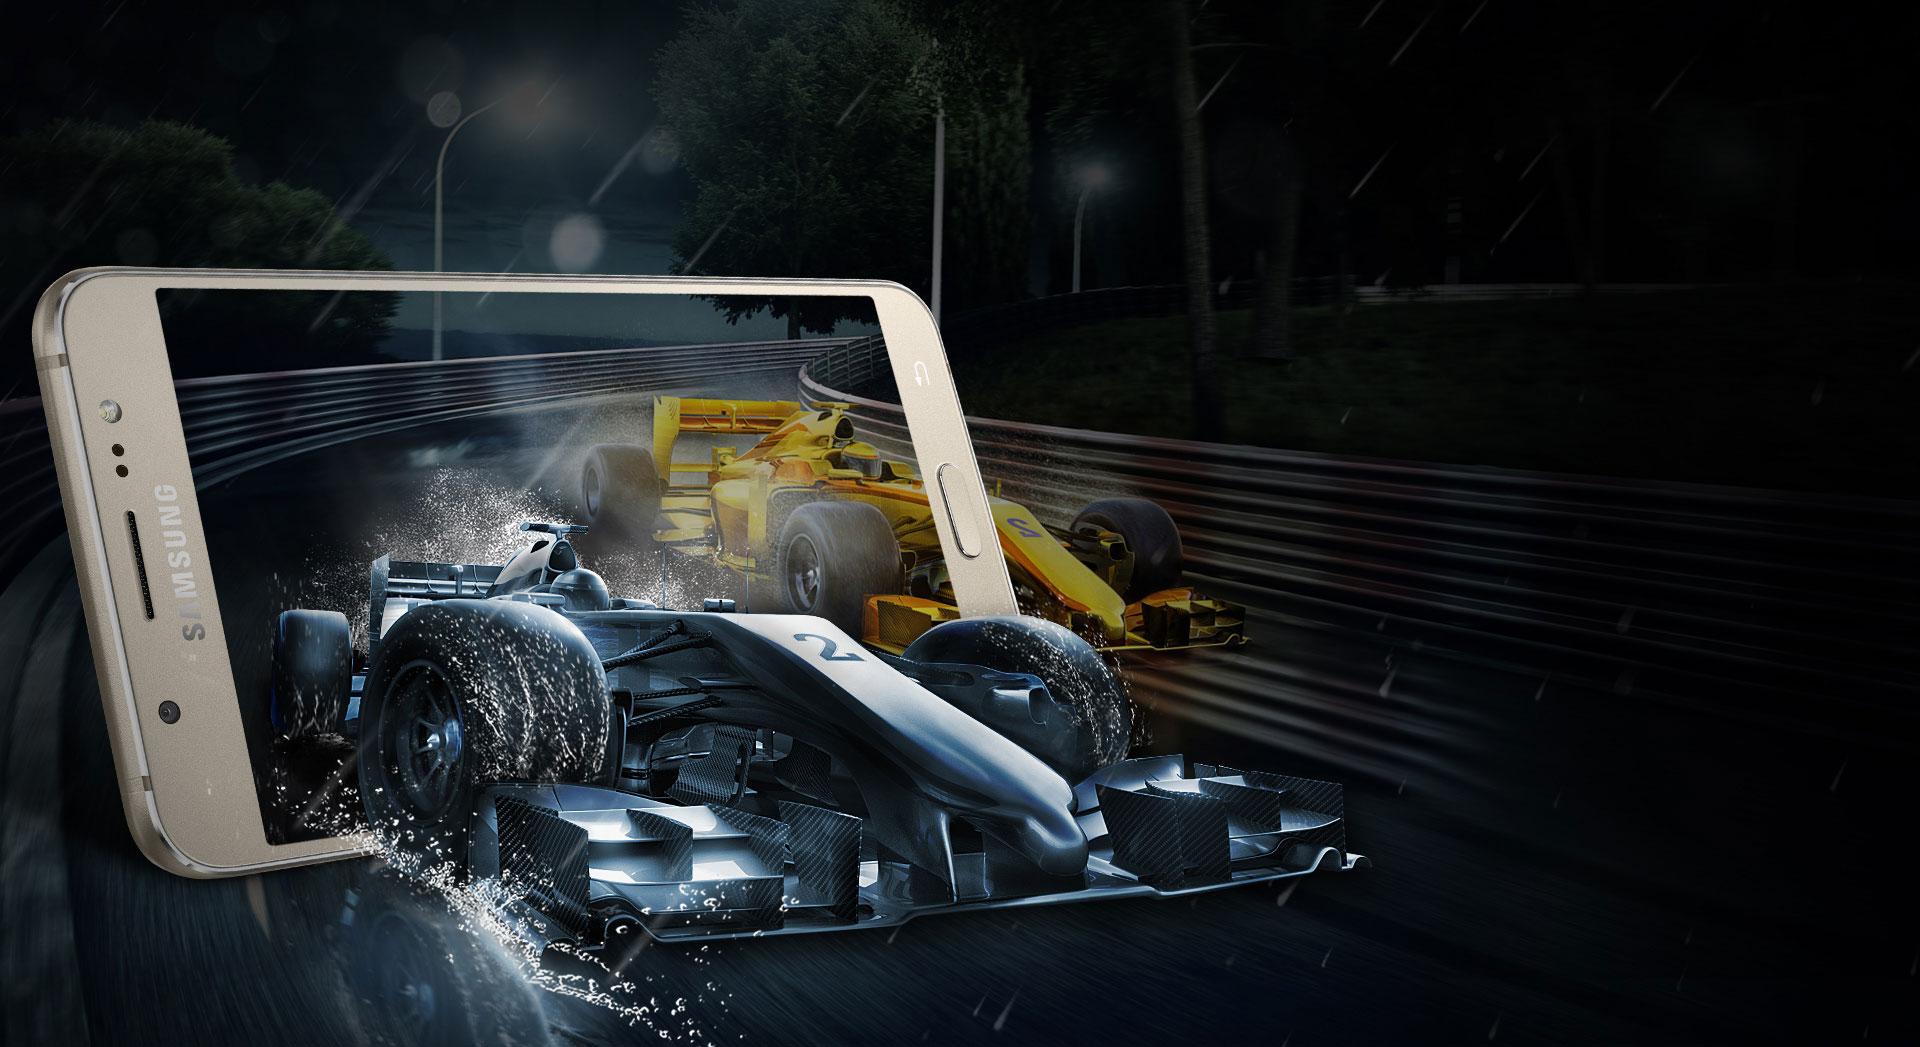 Samsung Galaxy J7 2016 con videojuego